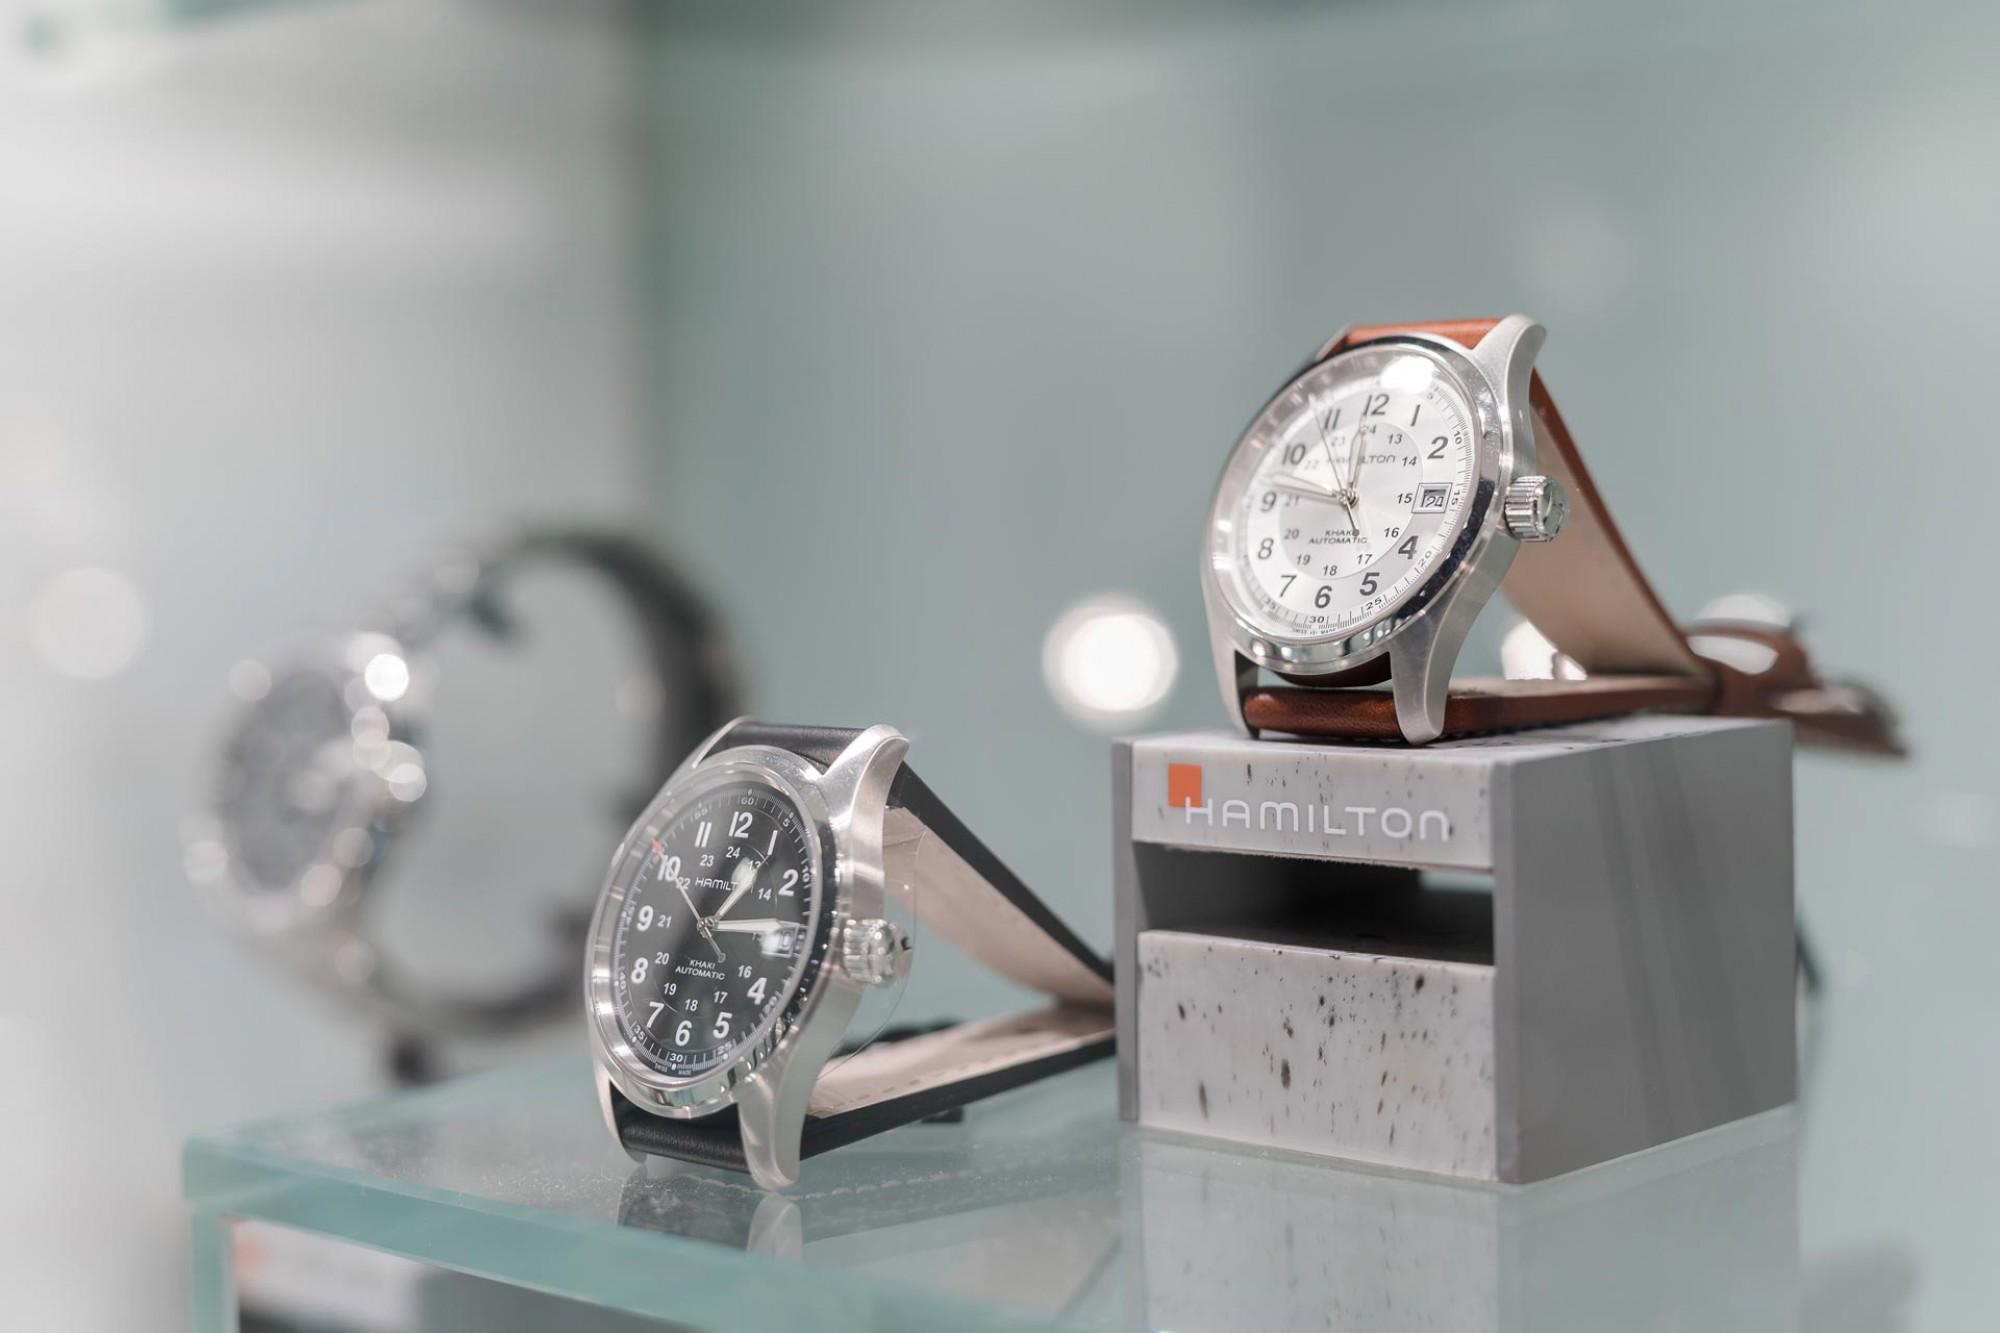 eurobijoux gioielleria orologi donna uomo bambino